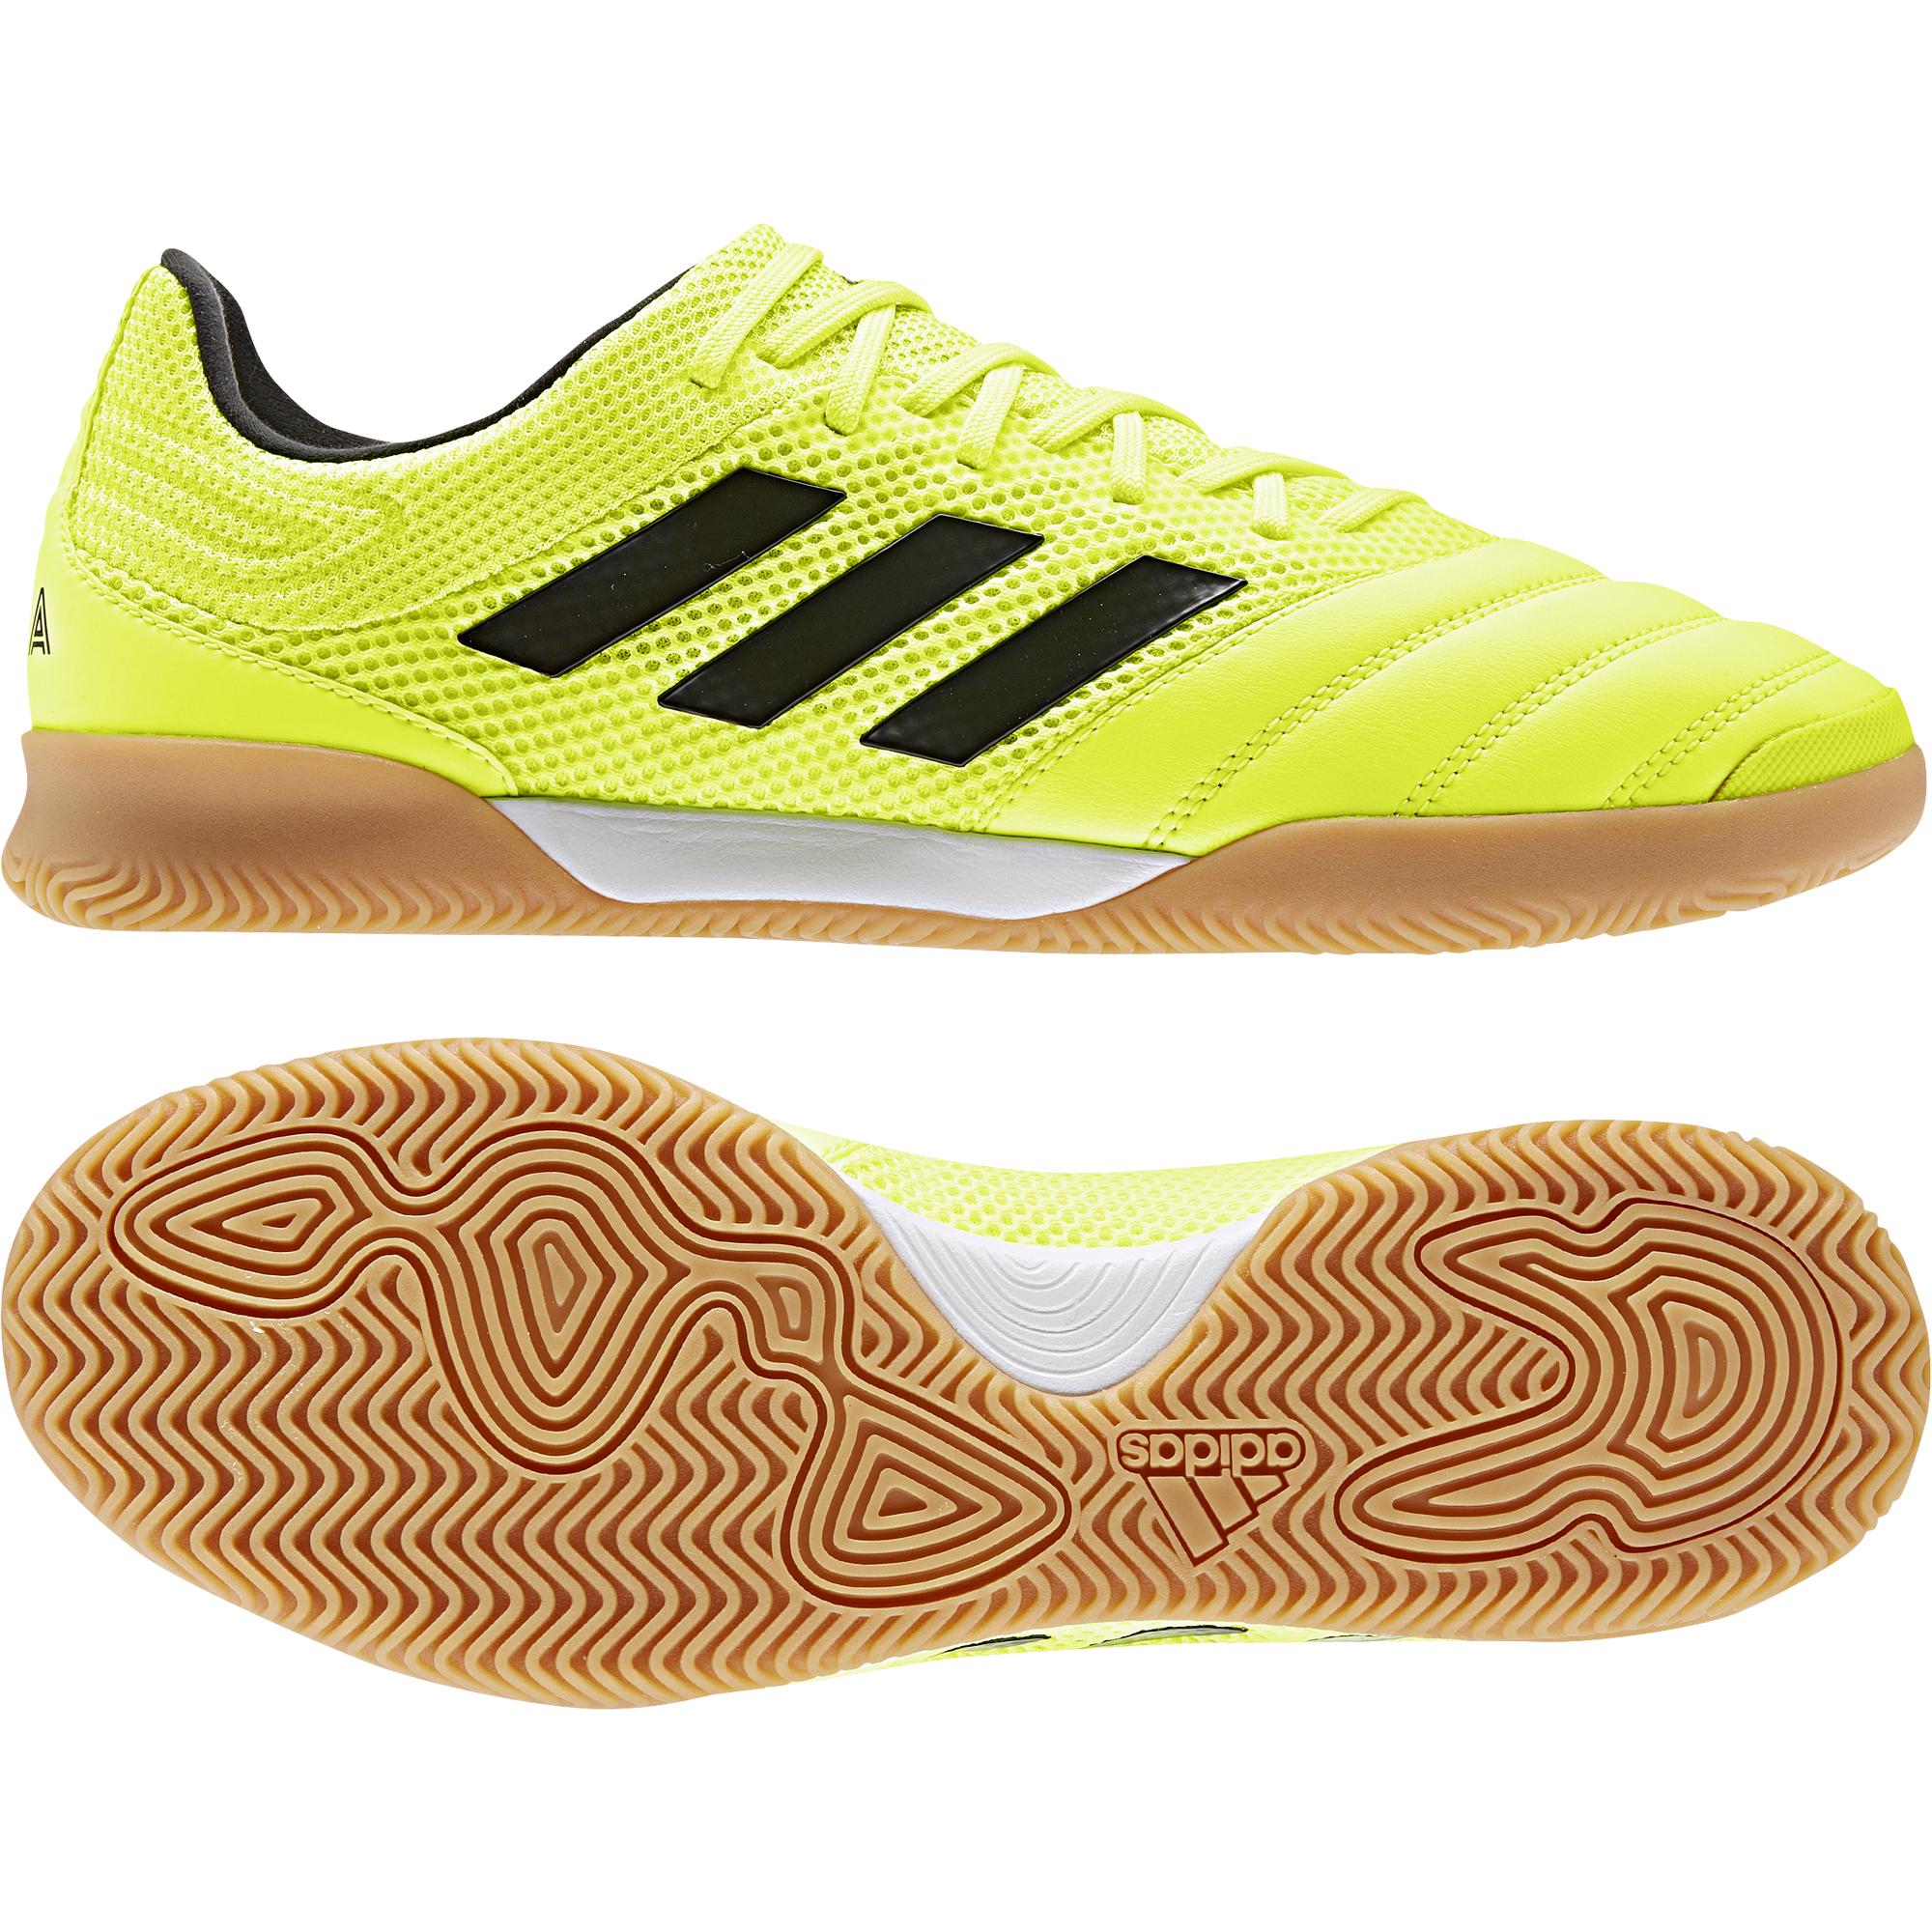 adidas COPA SALA 19.3 IN Hallenschuh neongelb